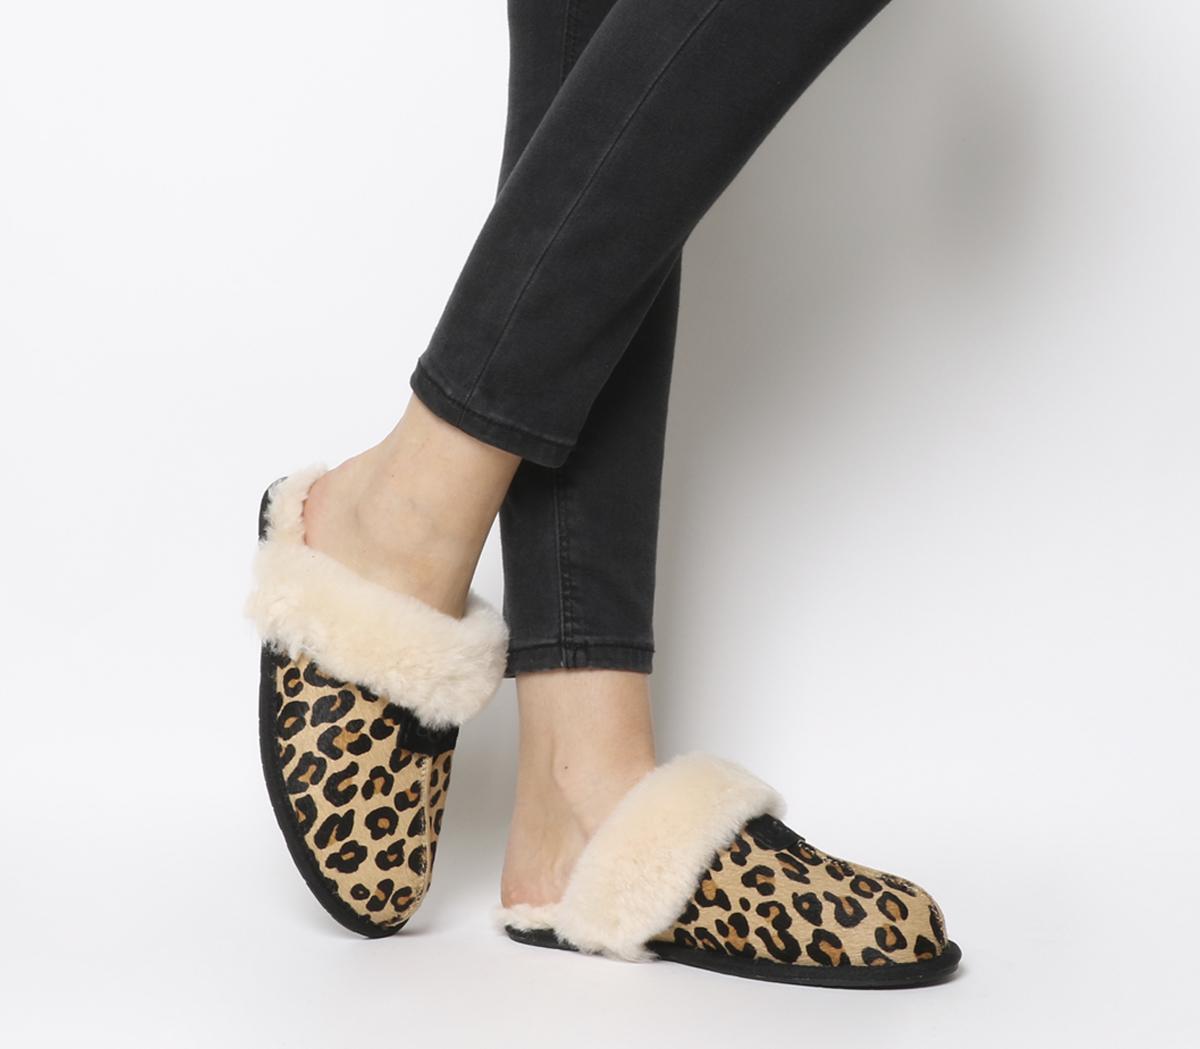 UGG Scuffette Ii Slippers Leopard